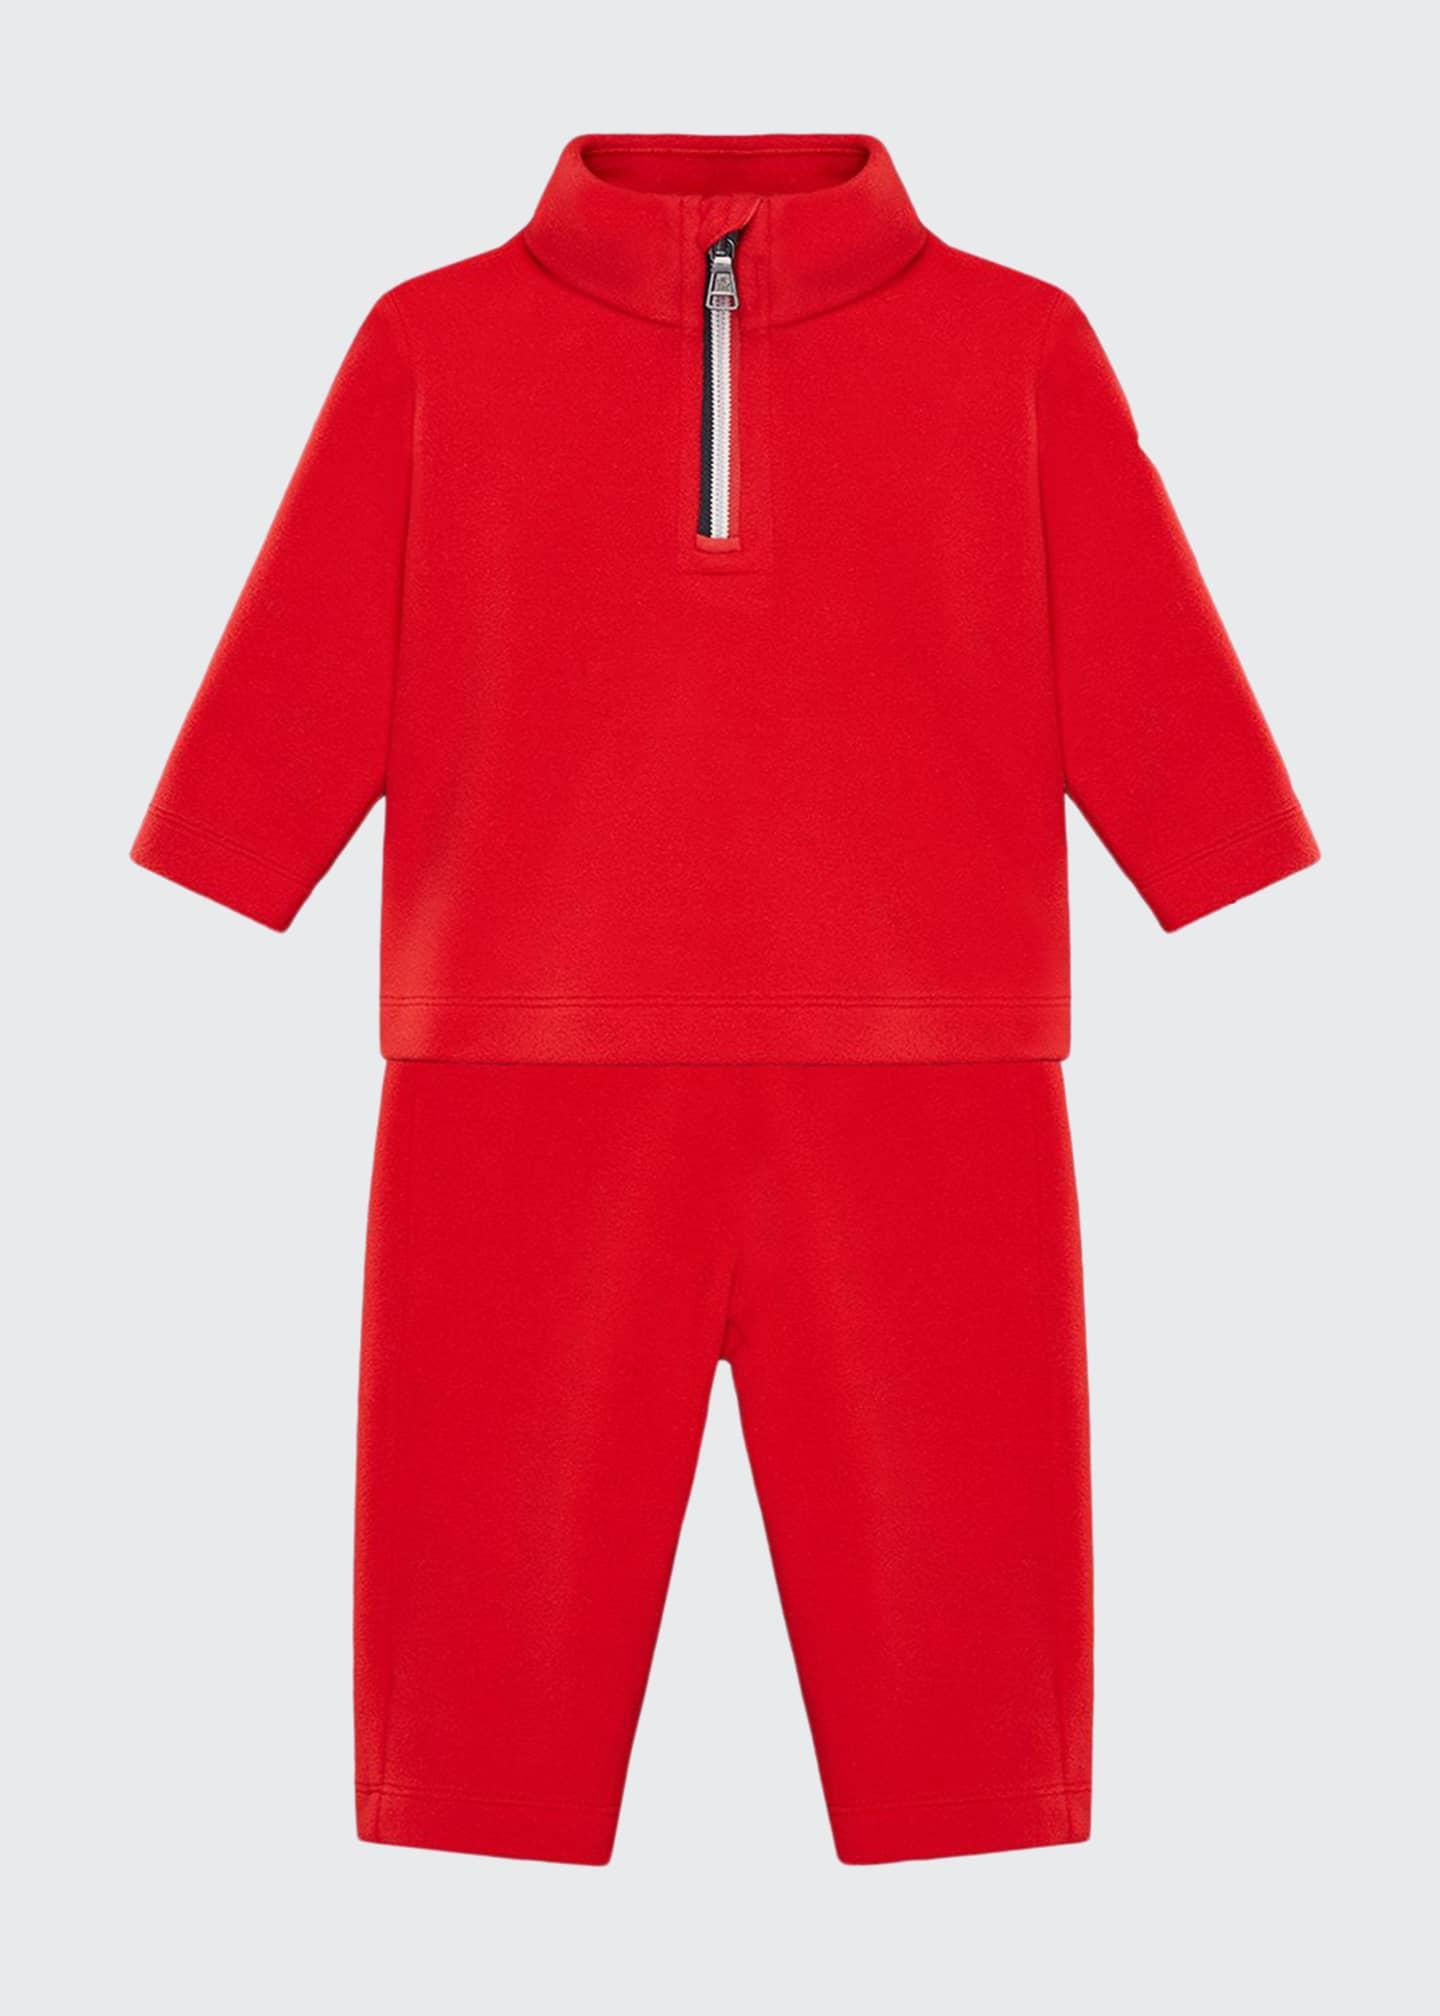 Moncler Half-Zip Jacket w/ Matching Sweatpants, Size 6M-3